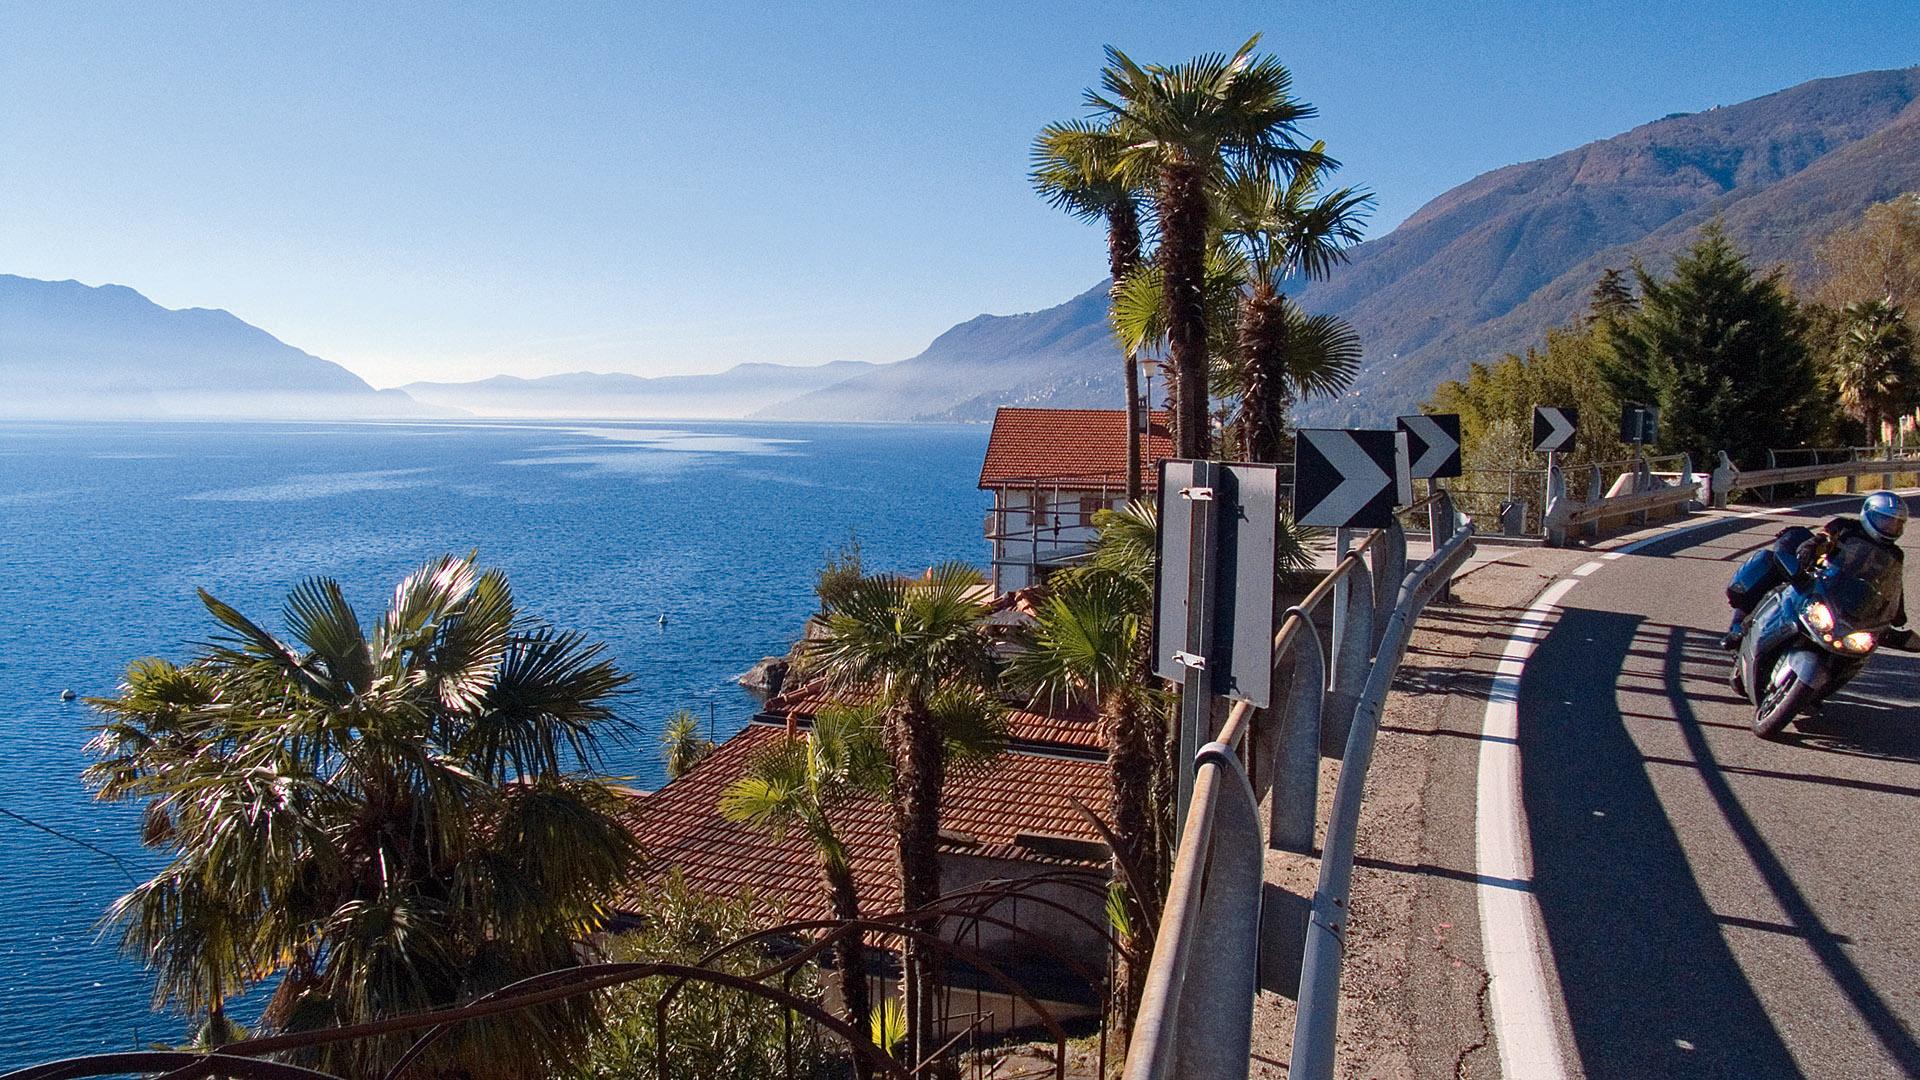 Wasserspiele - Tour 3.1: Lago d'Iseo